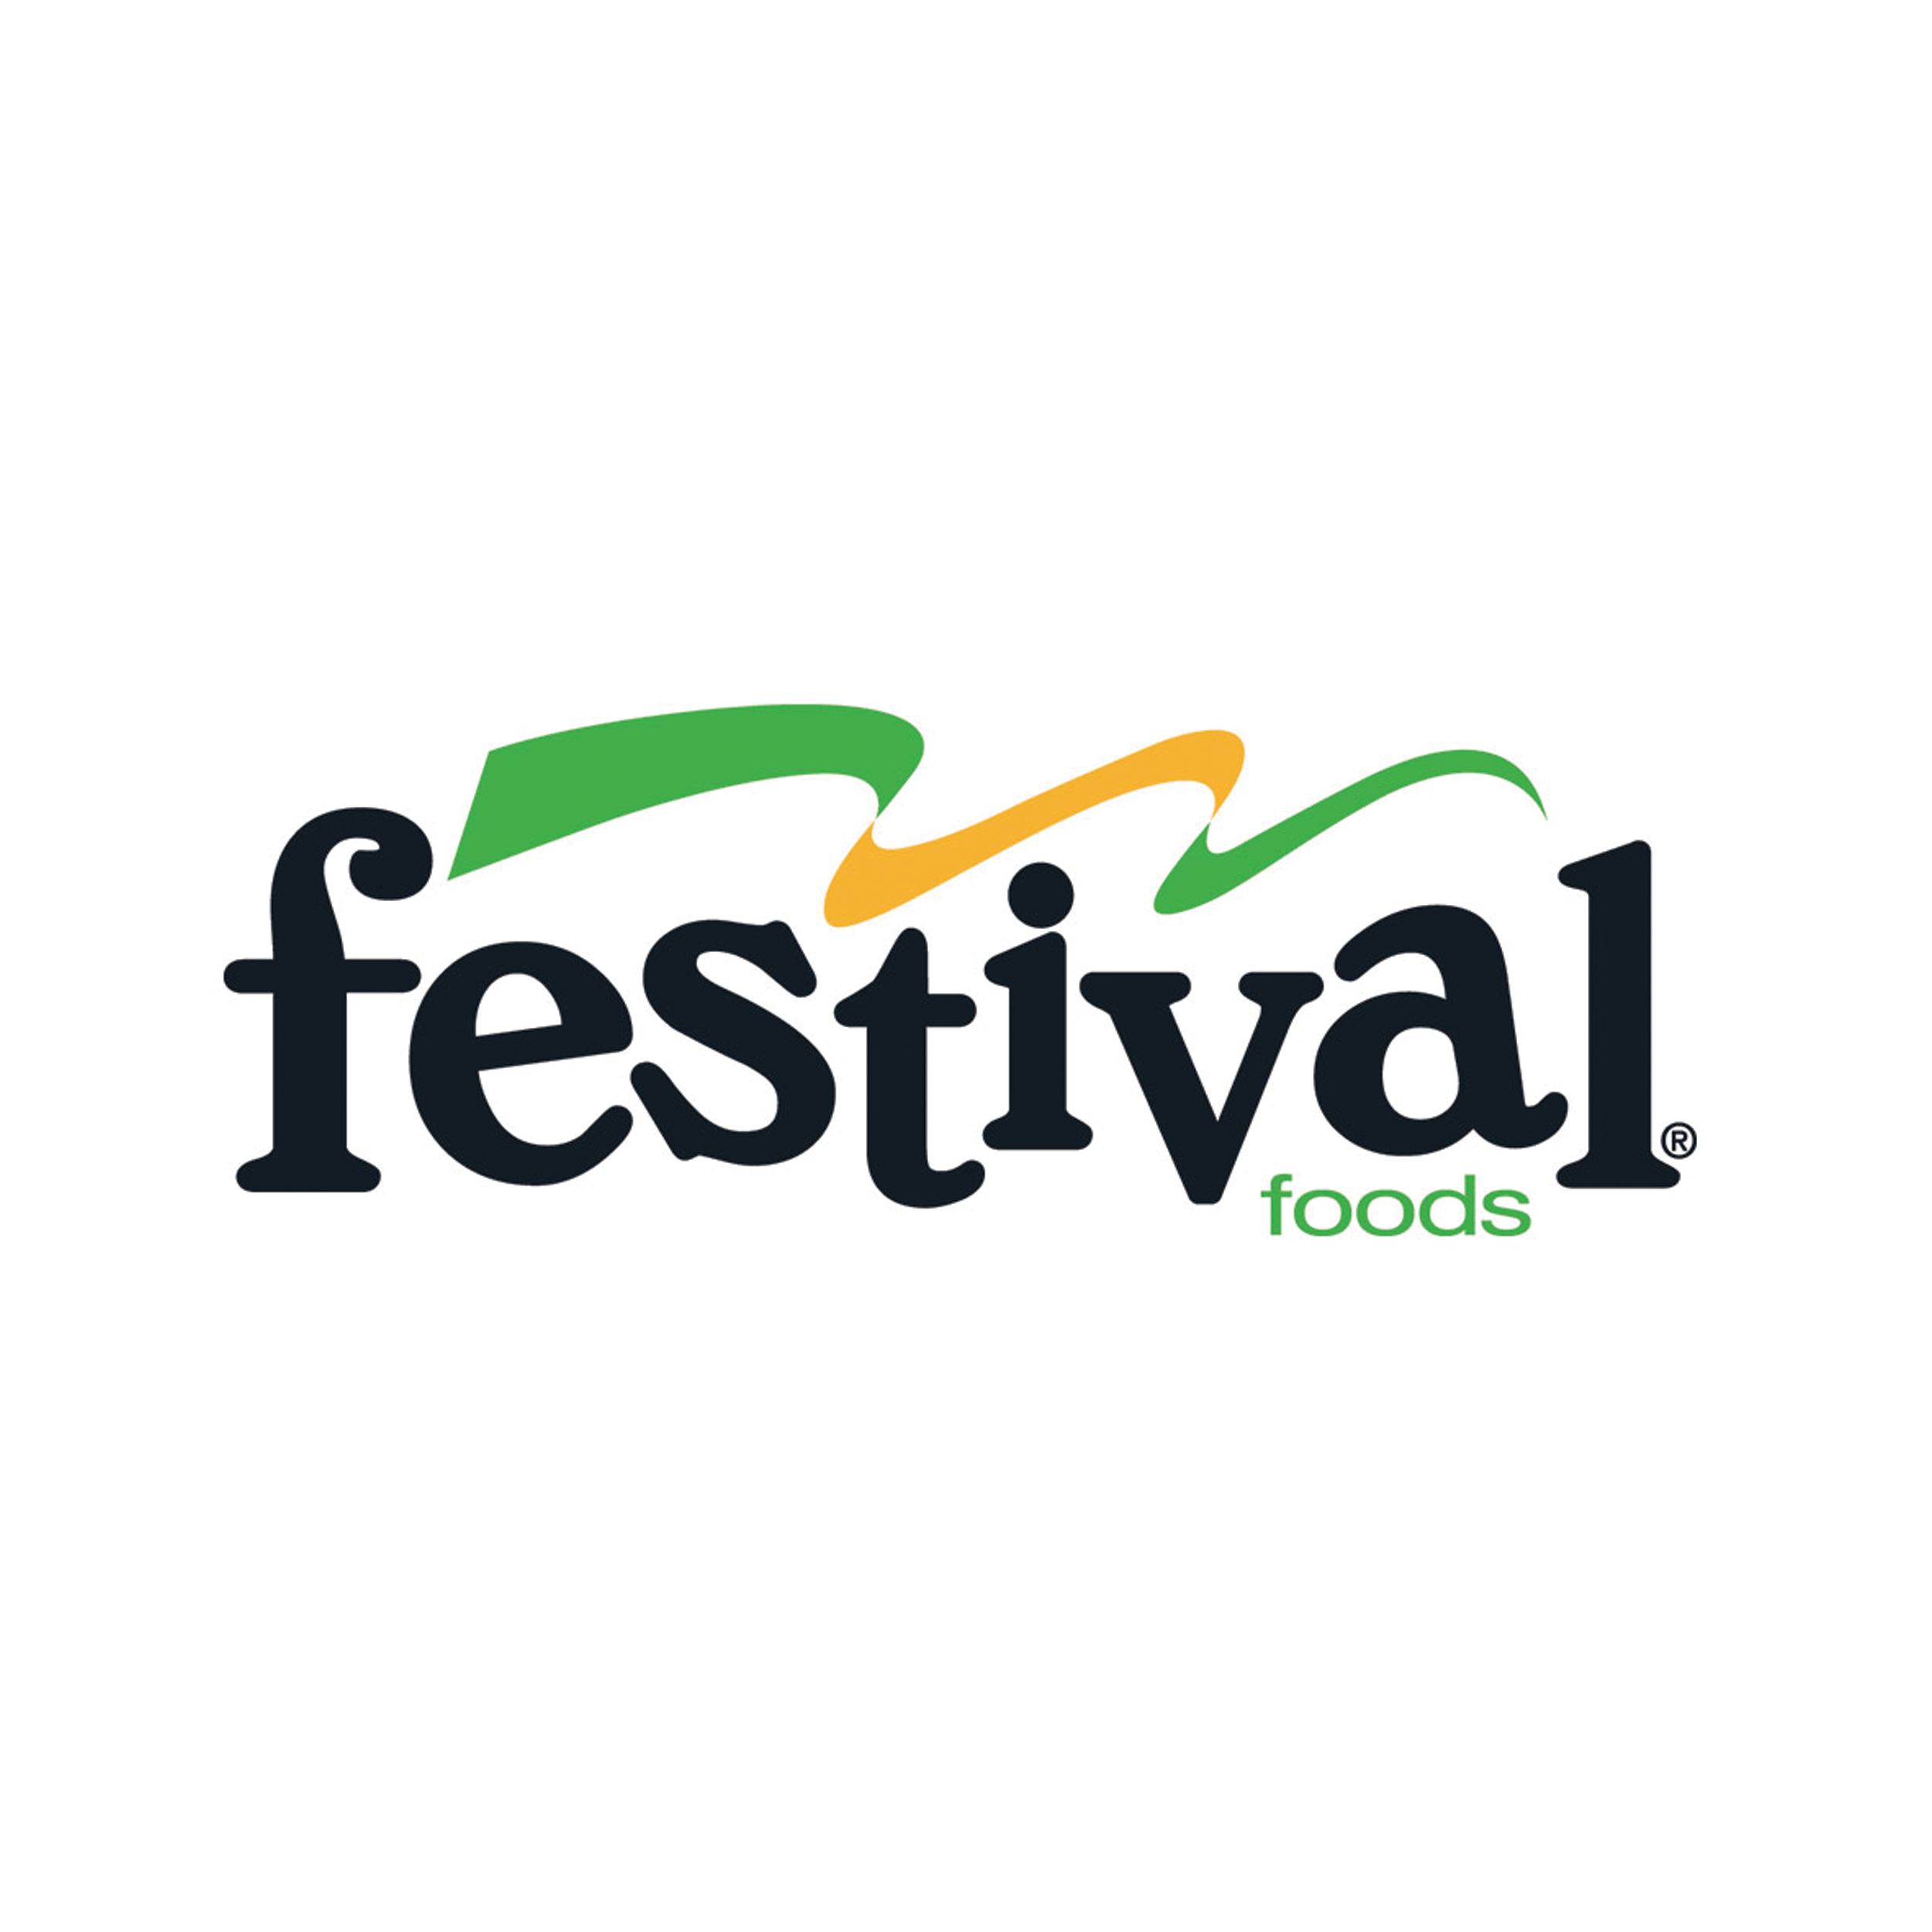 festival-foods.png